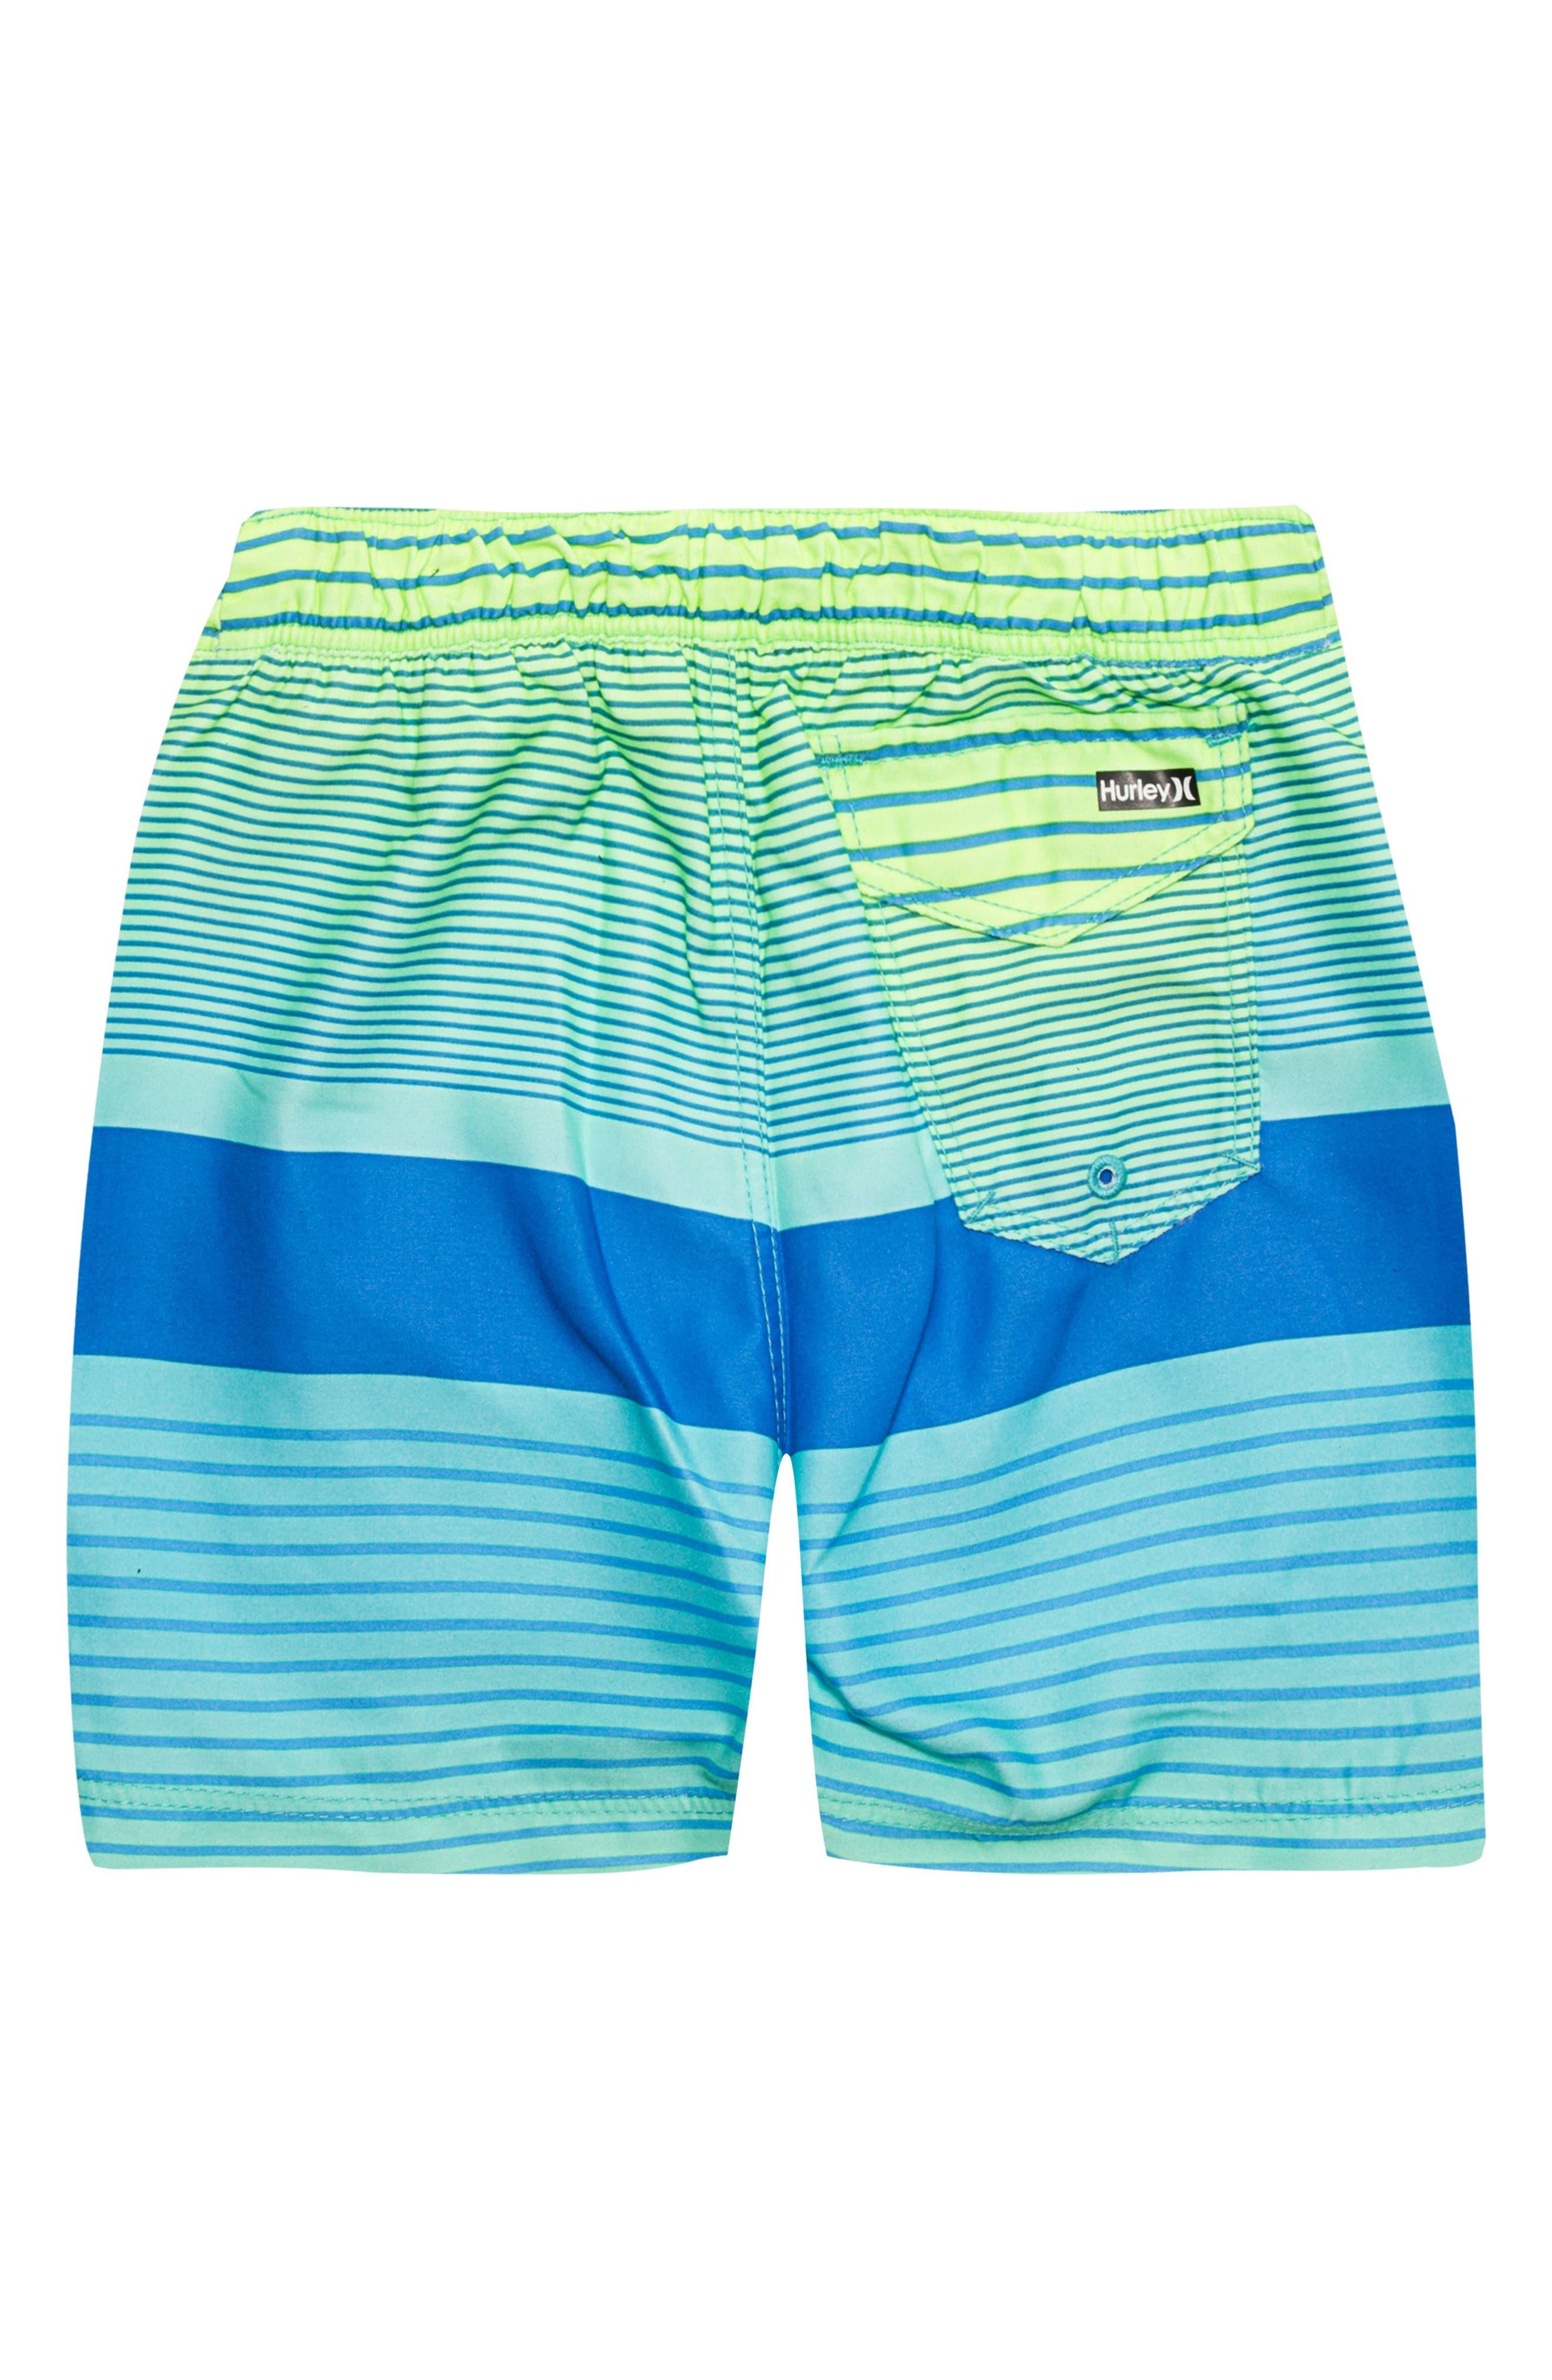 Line Up Board Shorts,                             Alternate thumbnail 2, color,                             361